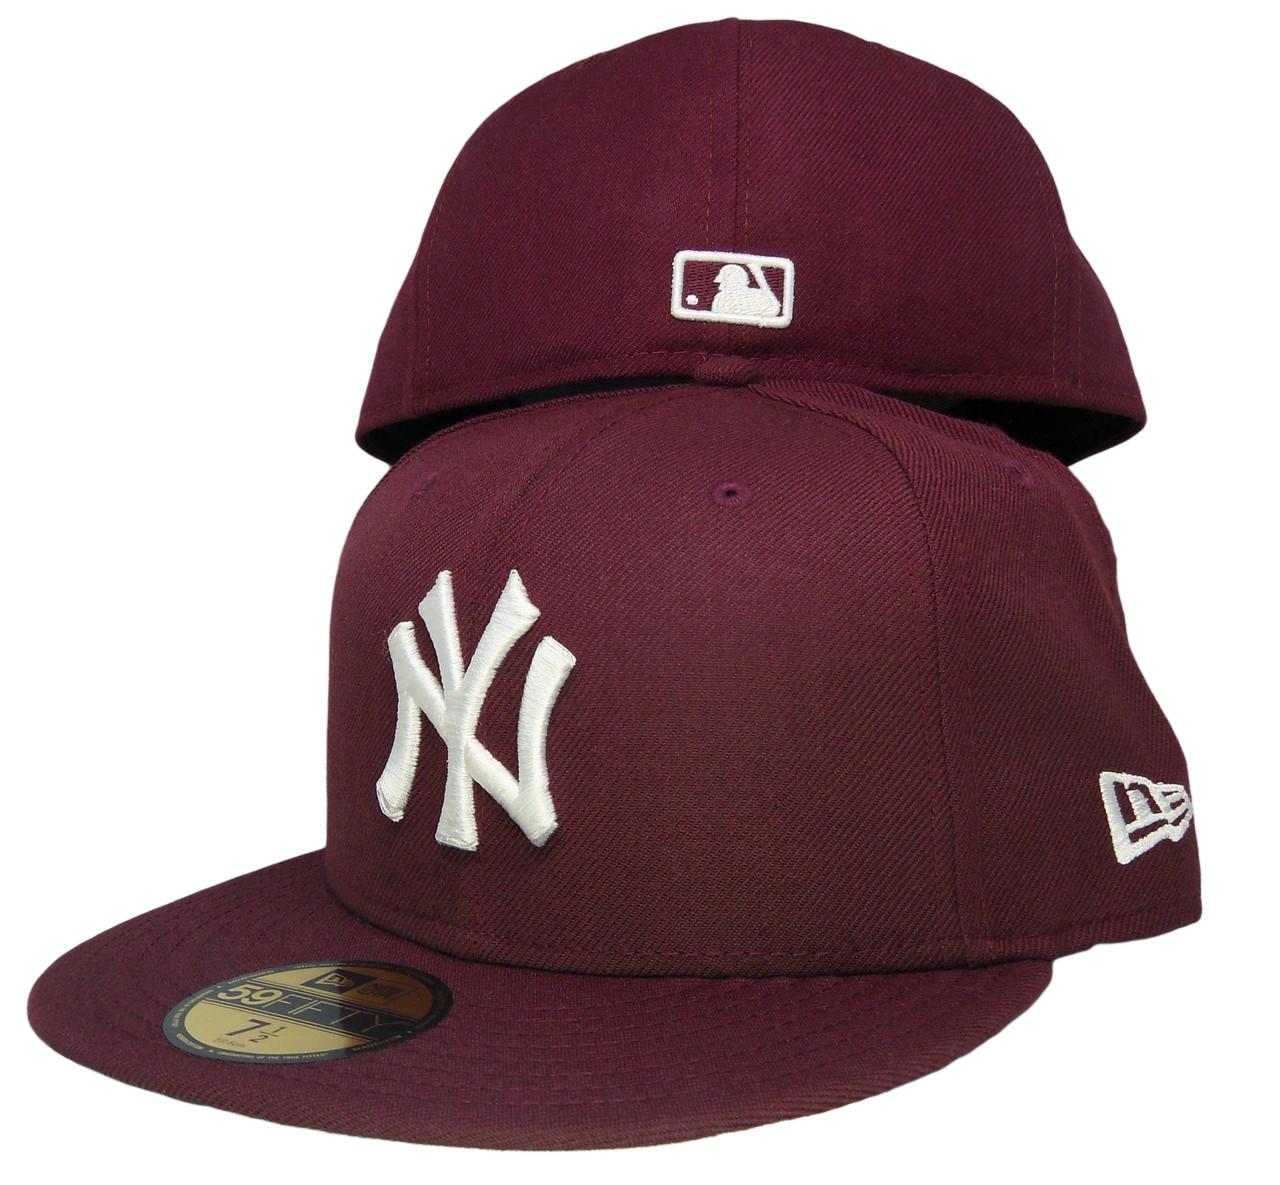 1c72adf4c9e ... wholesale new york yankees new era 59fifty basic fitted hat maroon white  2647c ababc